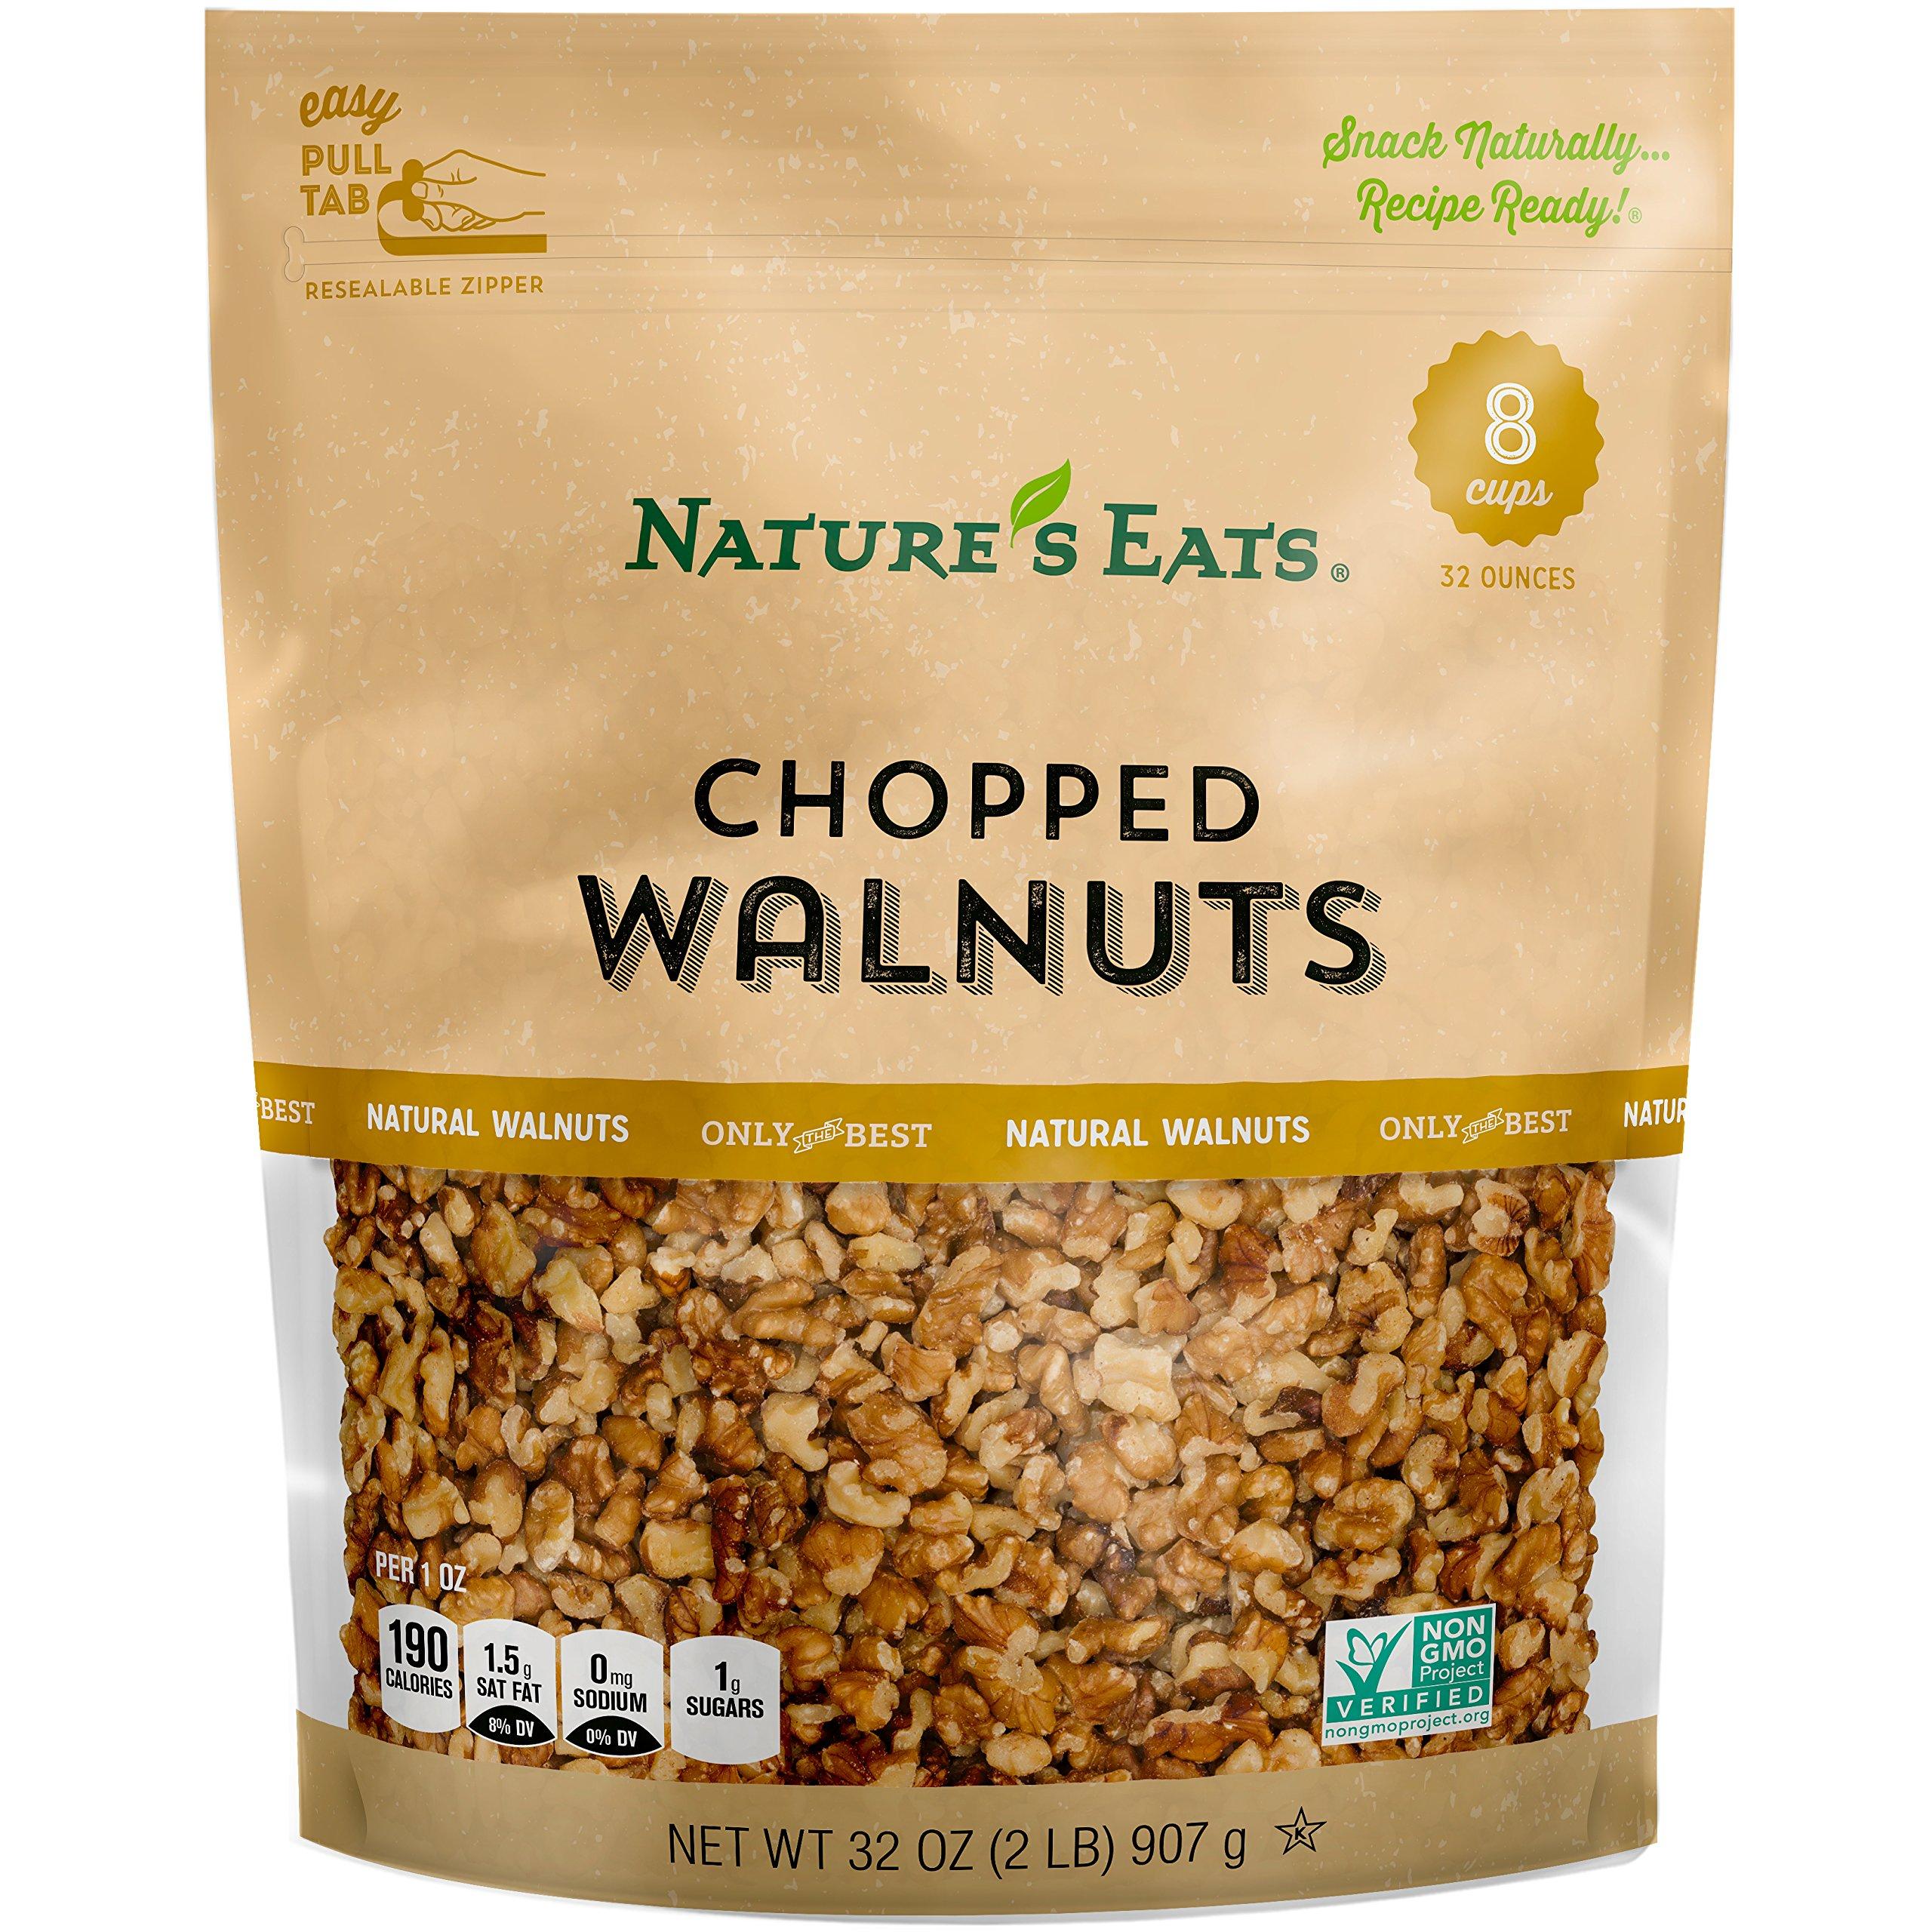 Nature's Eats Chopped Walnuts, 32 Ounce